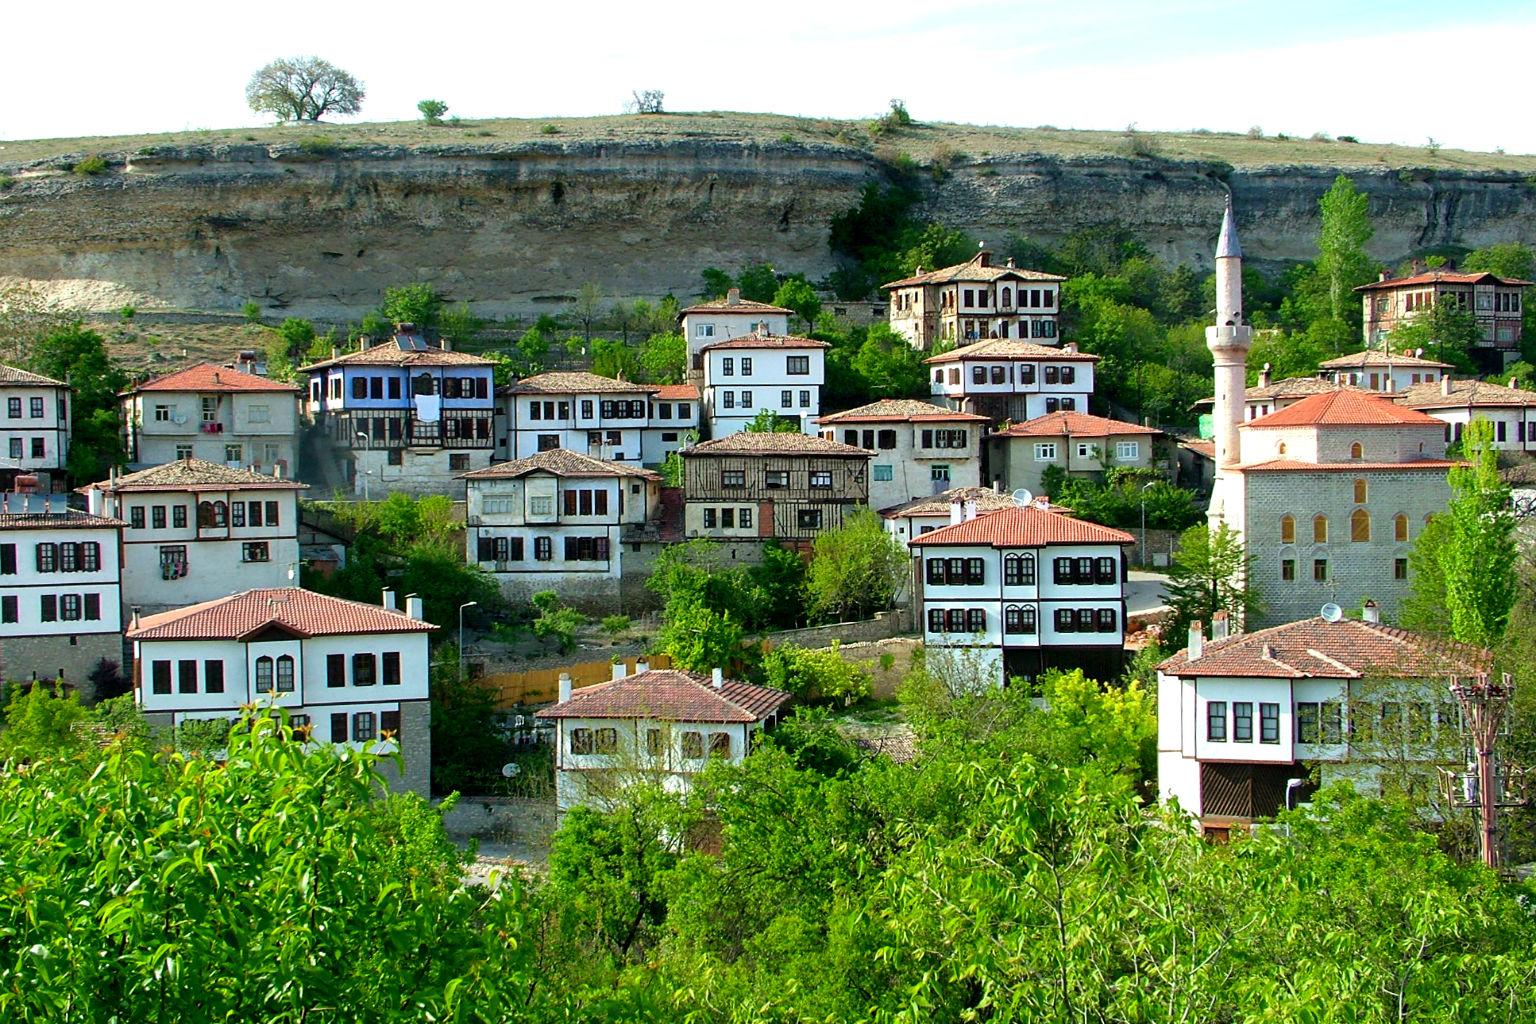 Safranbolu Nerede, Hangi Şehirde